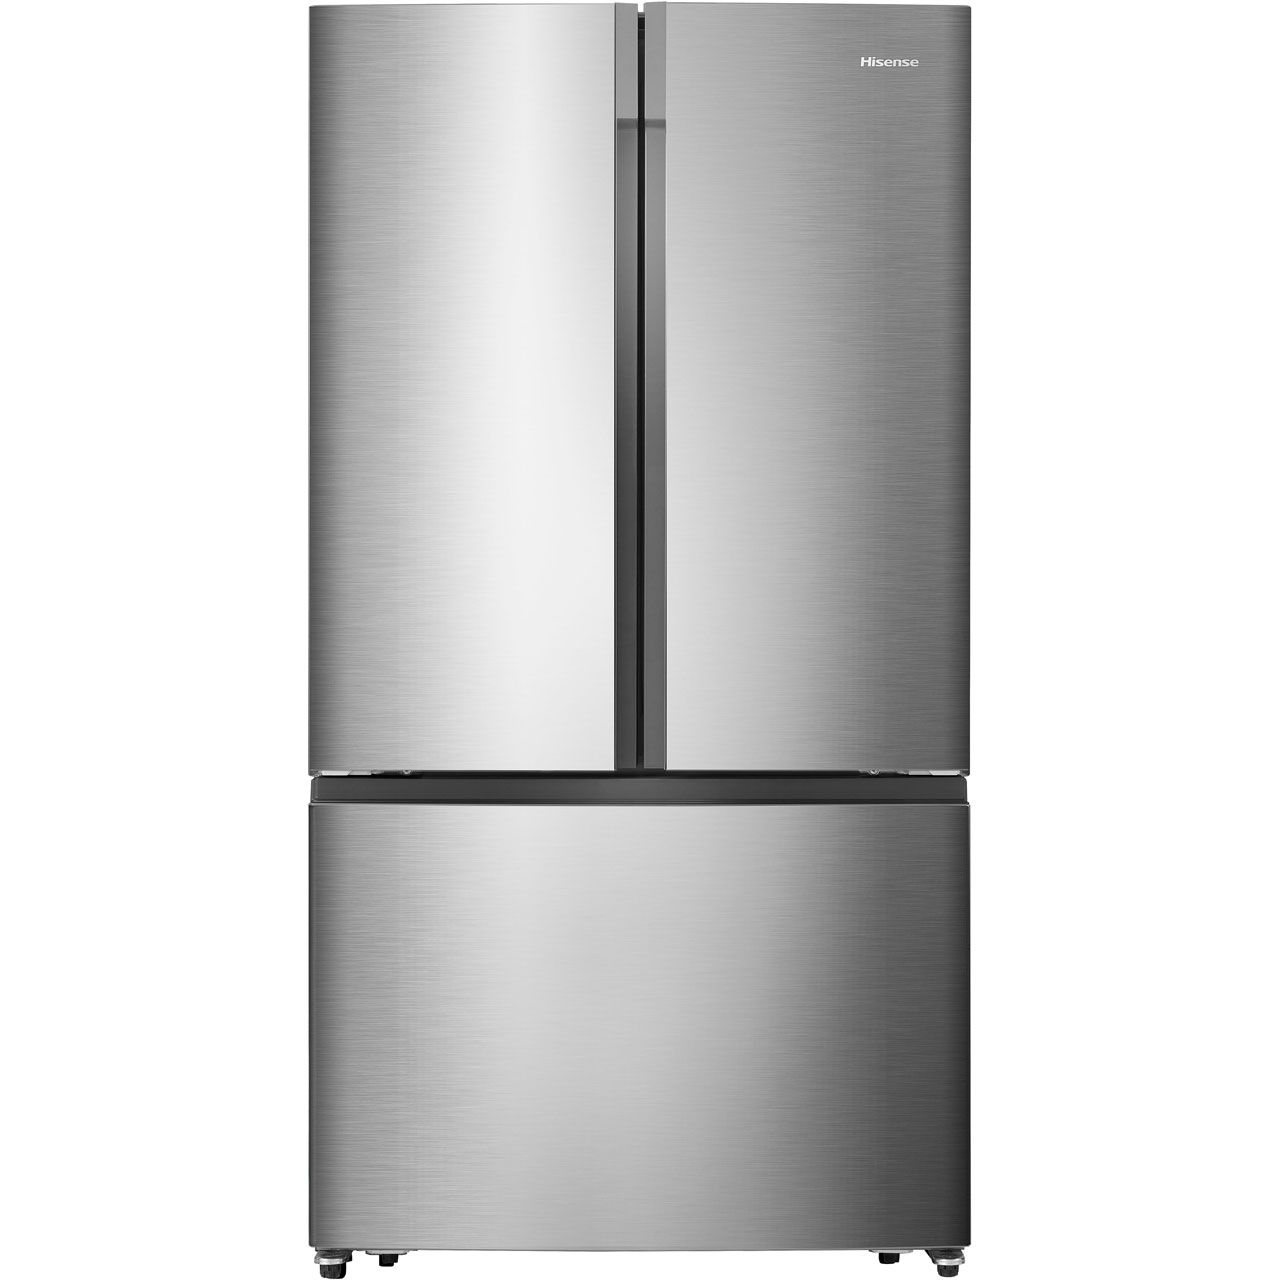 Hisense Rf715n4as1 American Fridge Freezer Stainless Steel A Rated American Fridge American Fridge Freezers Freezer